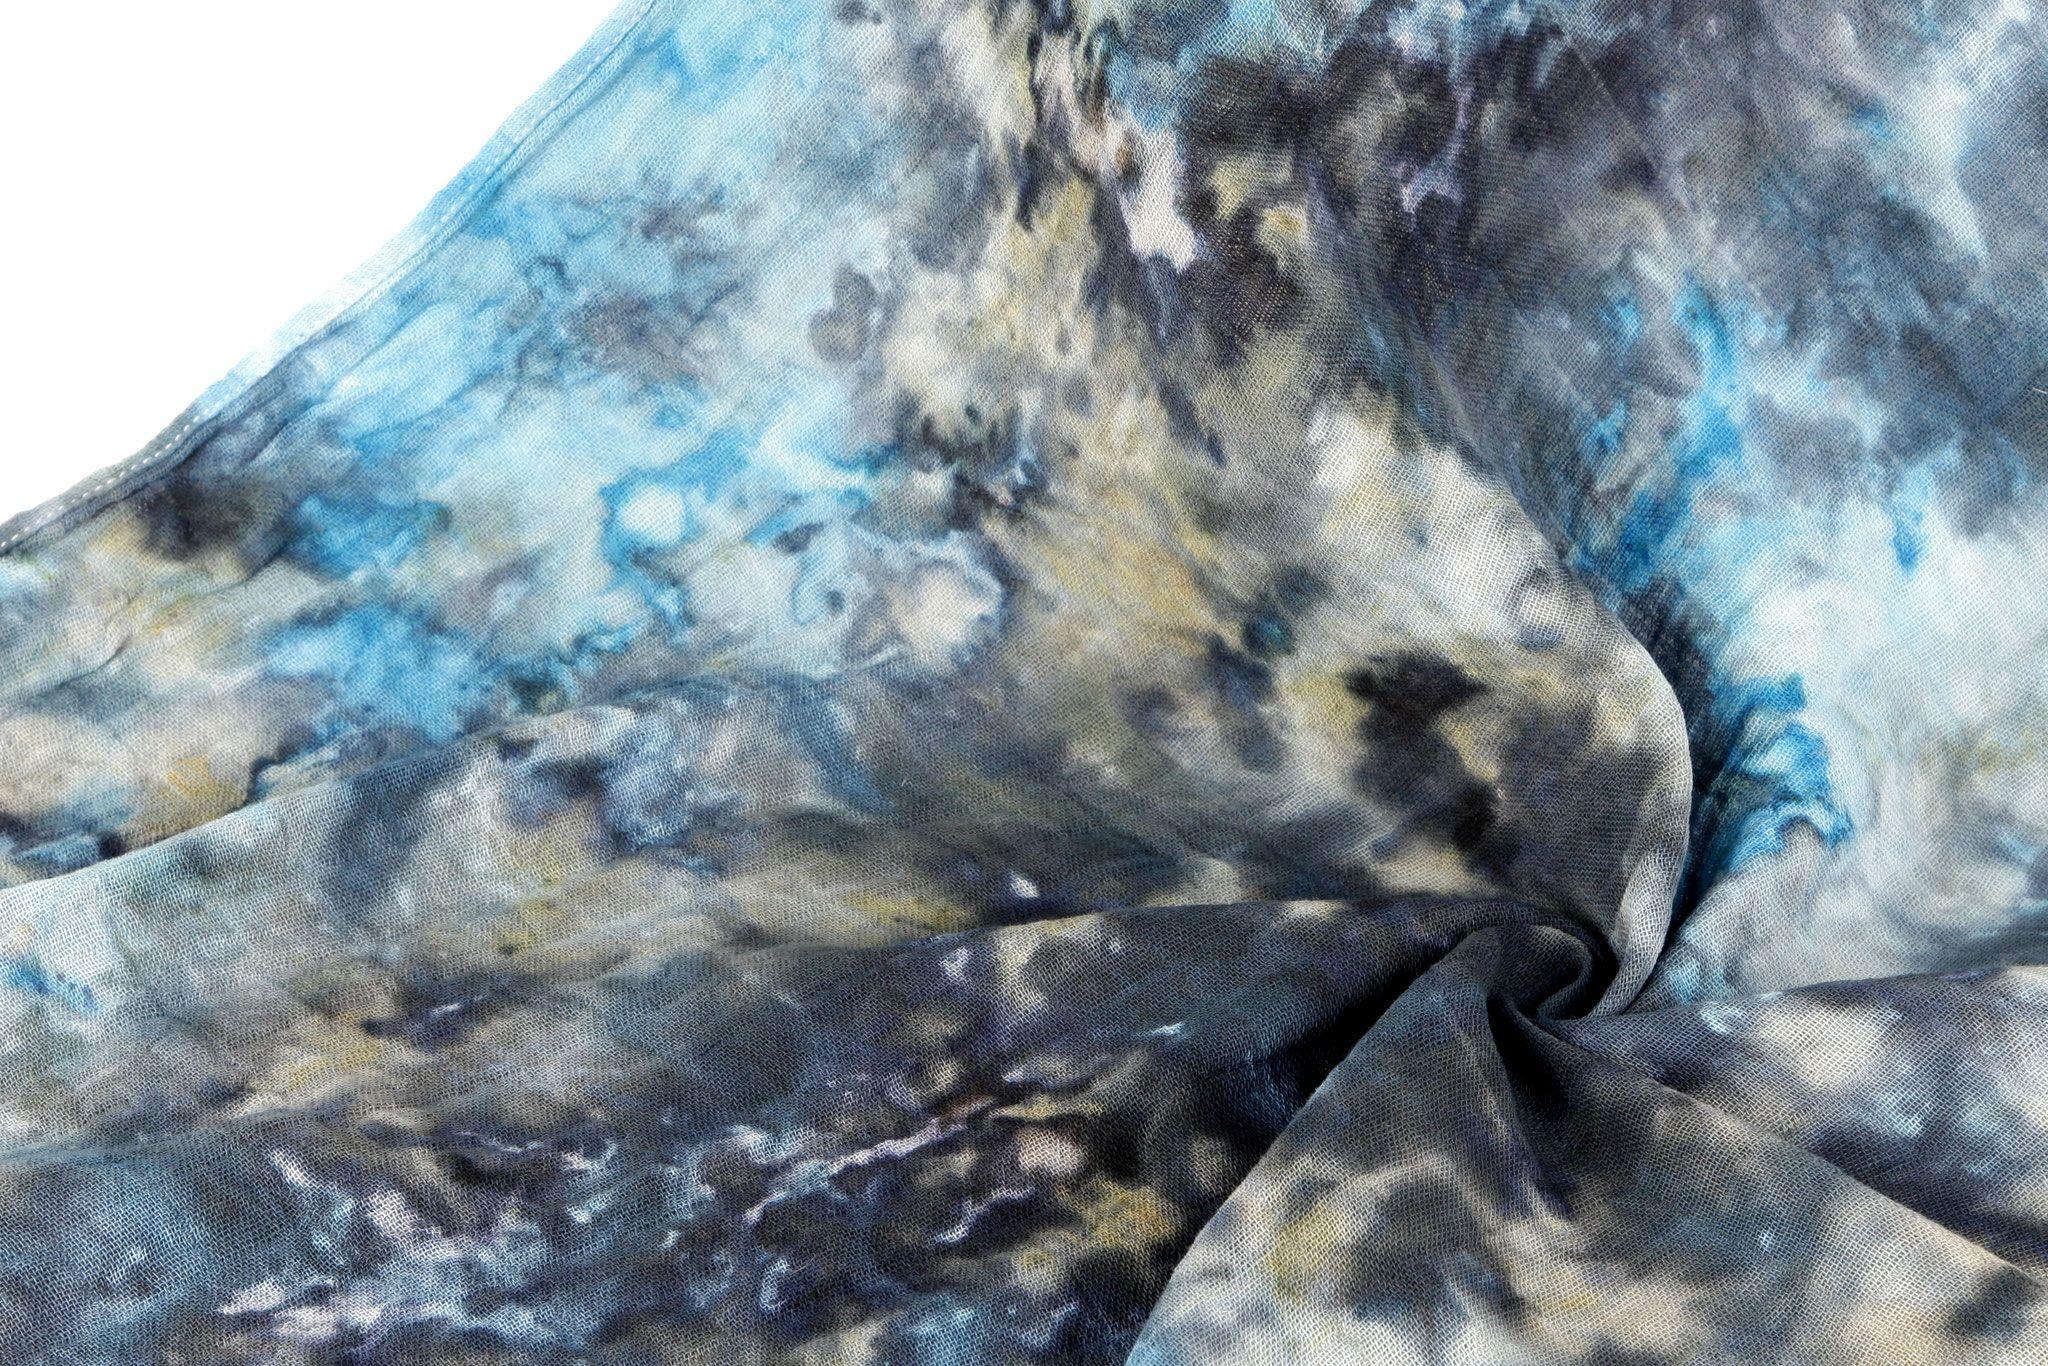 Stoff Mit Eiswurfeln Farben Batik Mit Eiswurfeln Stoffe Batik Muster Batikmuster